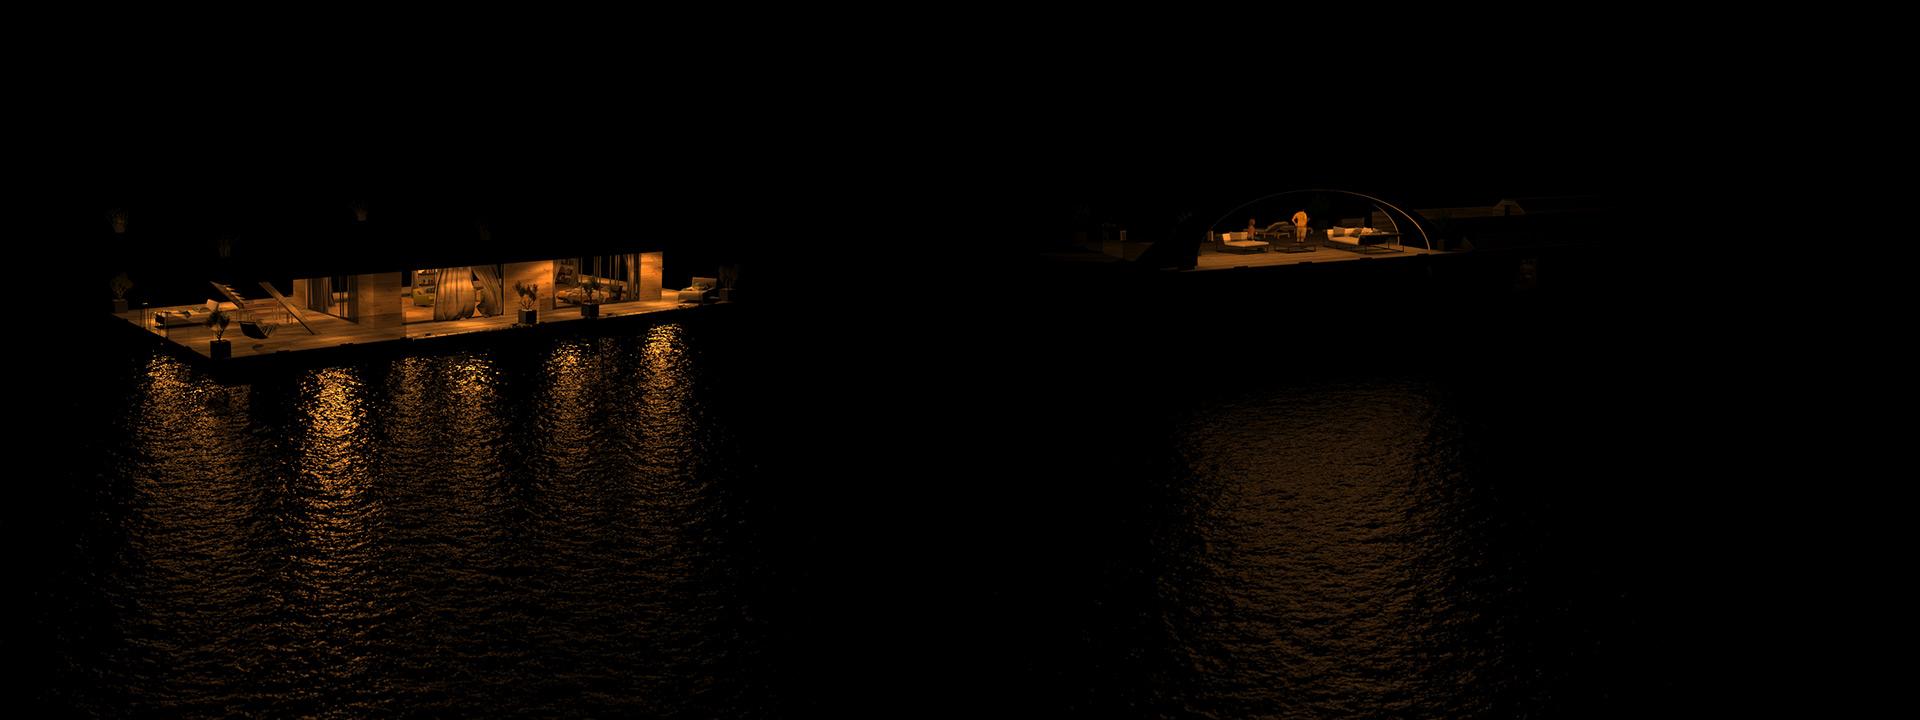 Tuto_cabin_lake_VRayLightSelectIESceiling_bridge.jpg